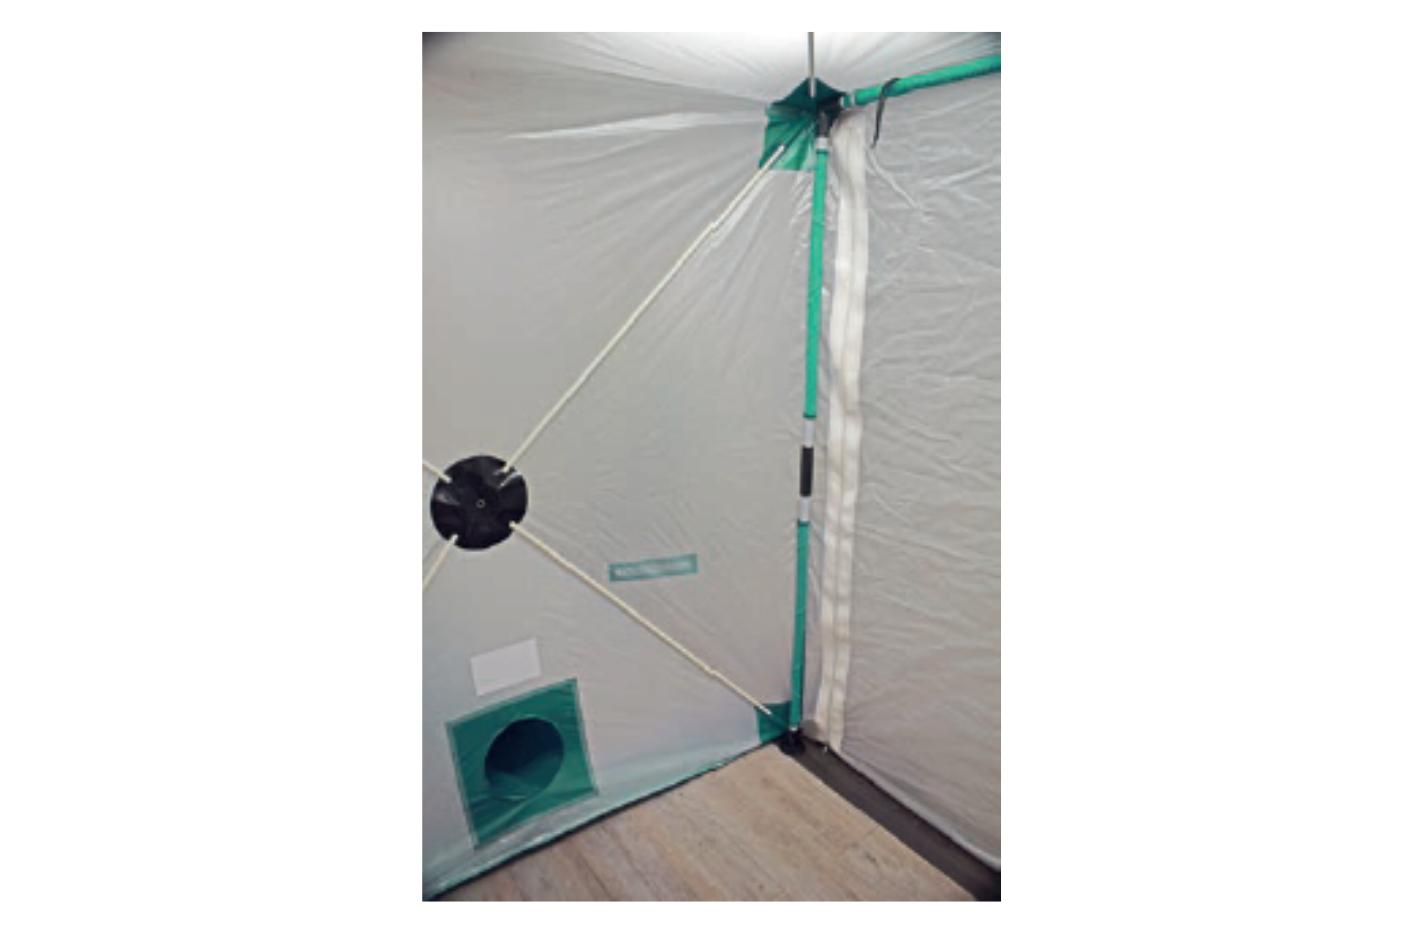 Dustex Air Lock in use 3